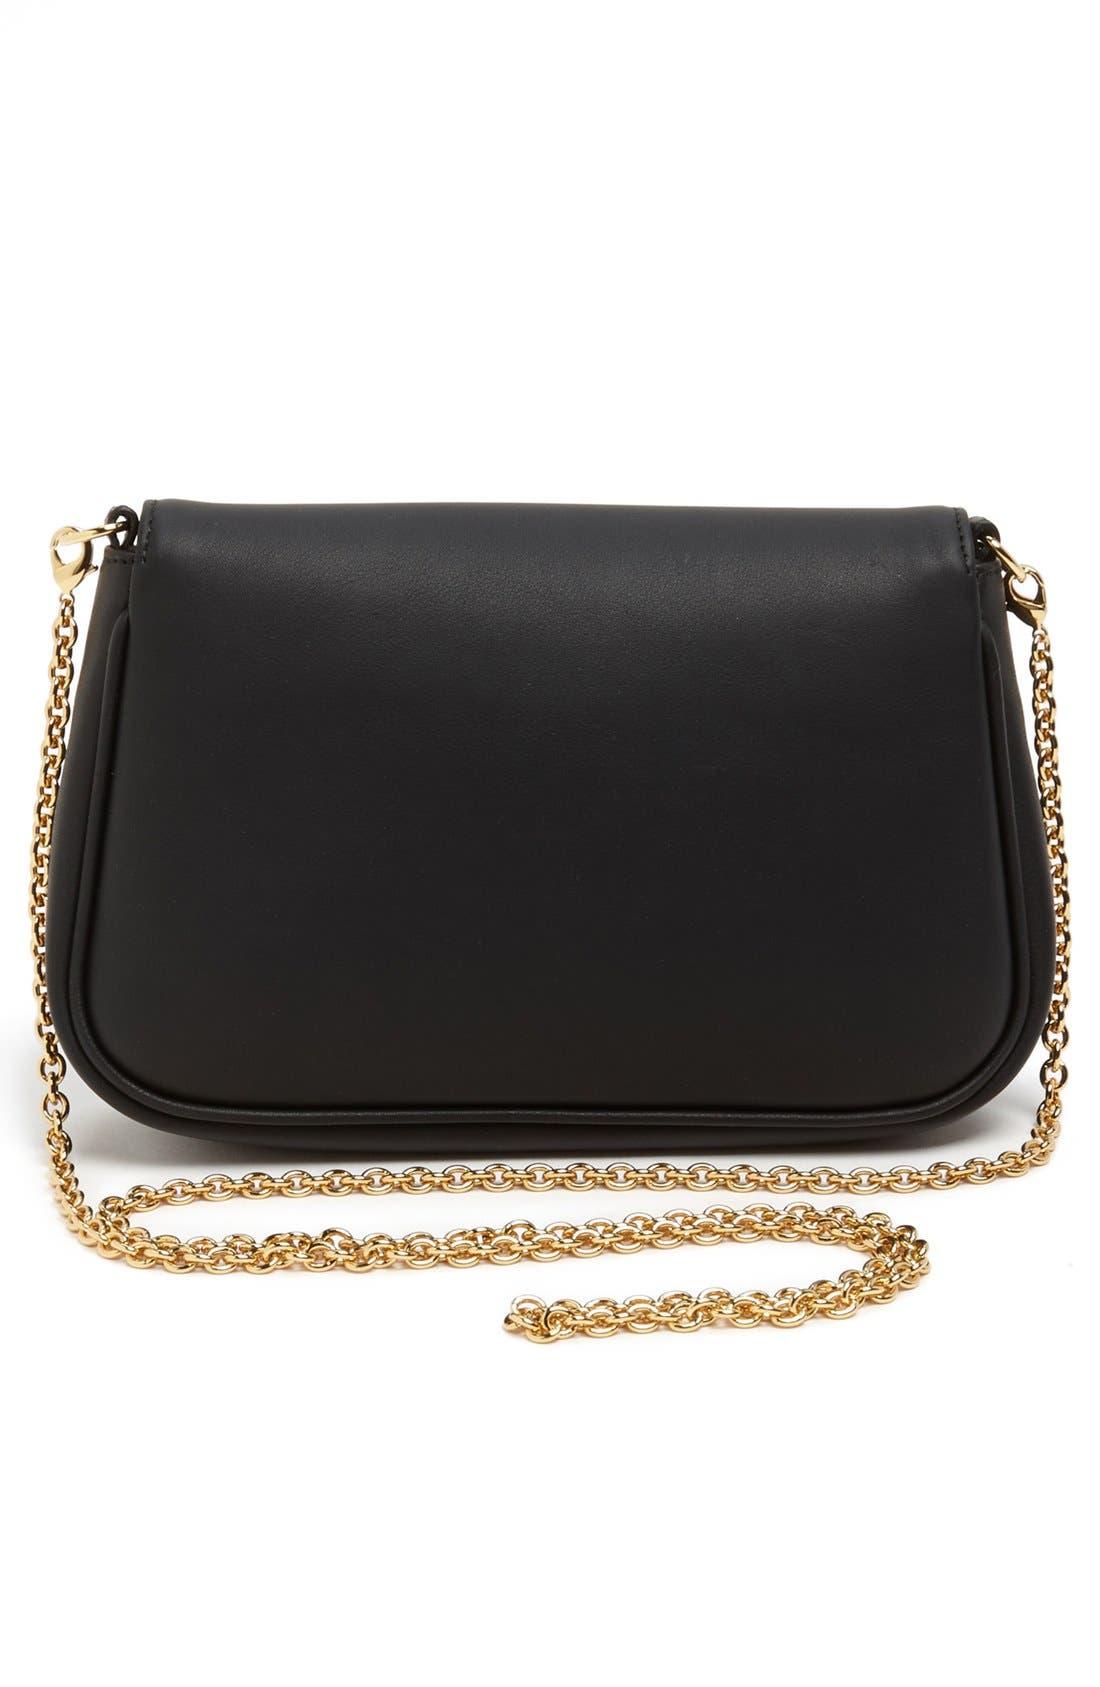 Alternate Image 3  - Fendi 'Fendista' Pouchette Crossbody Bag